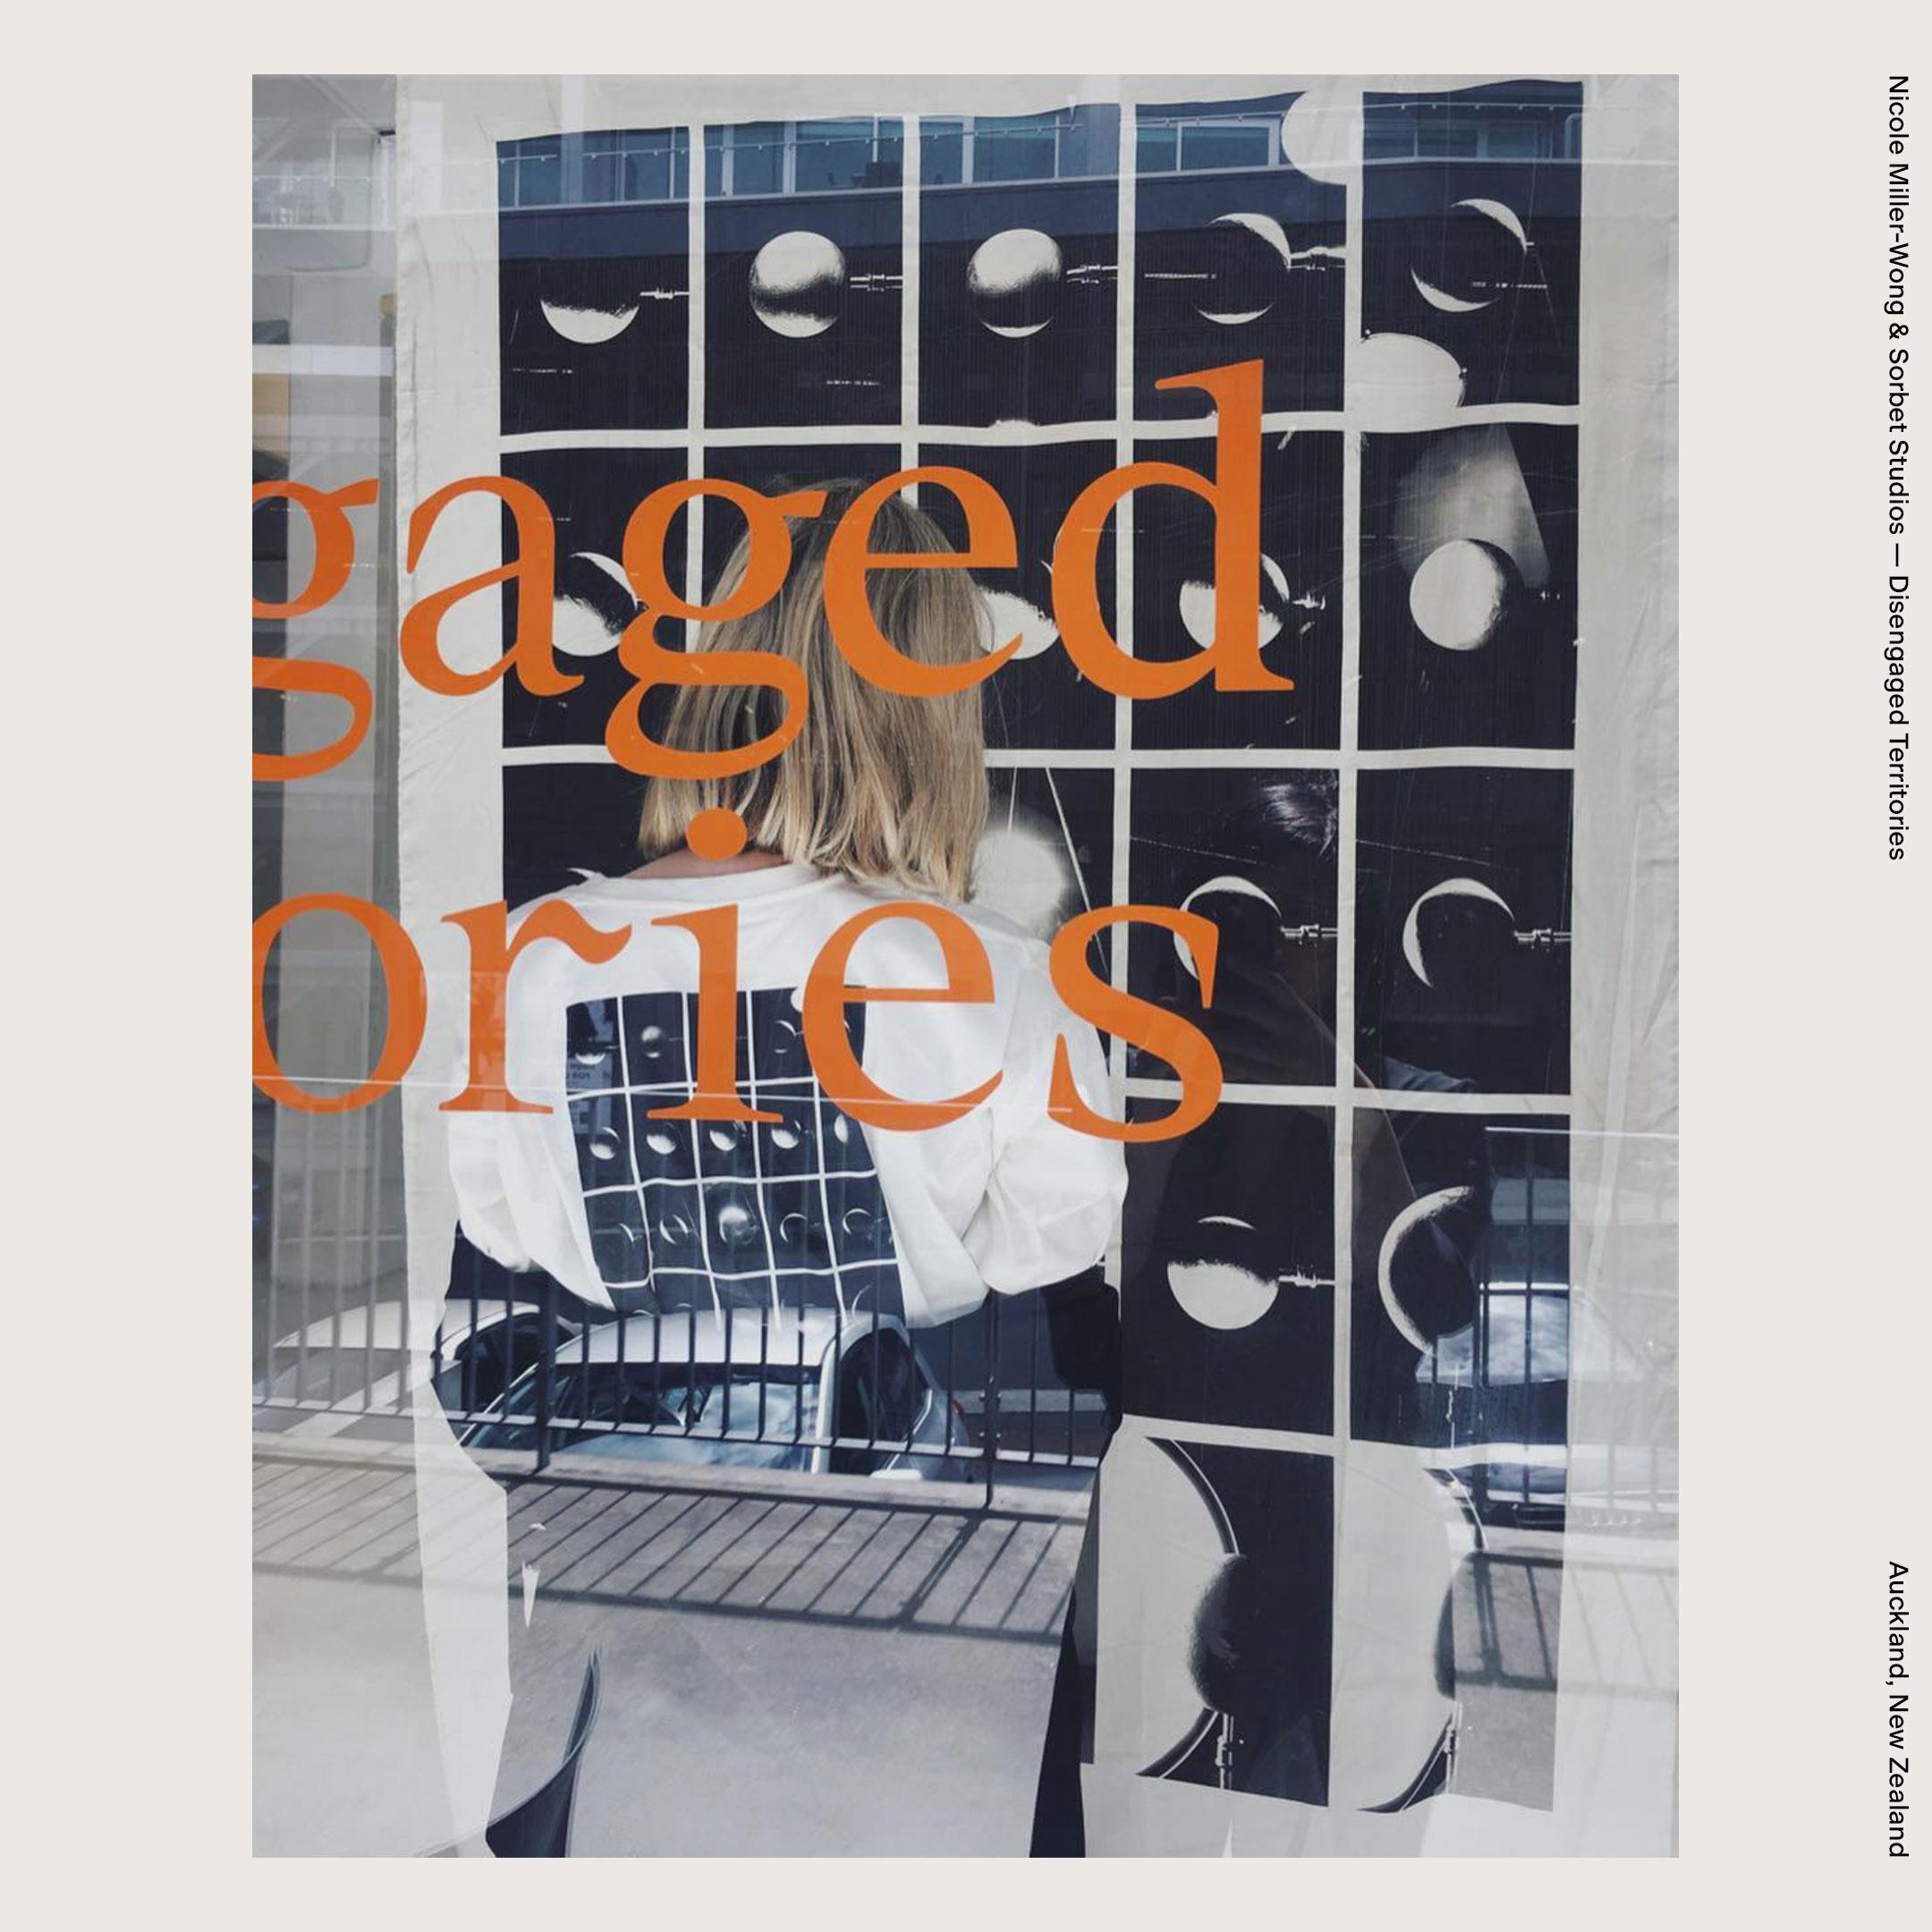 Nicole Miller-Wong & Sorbet Studios — Disengaged Territories